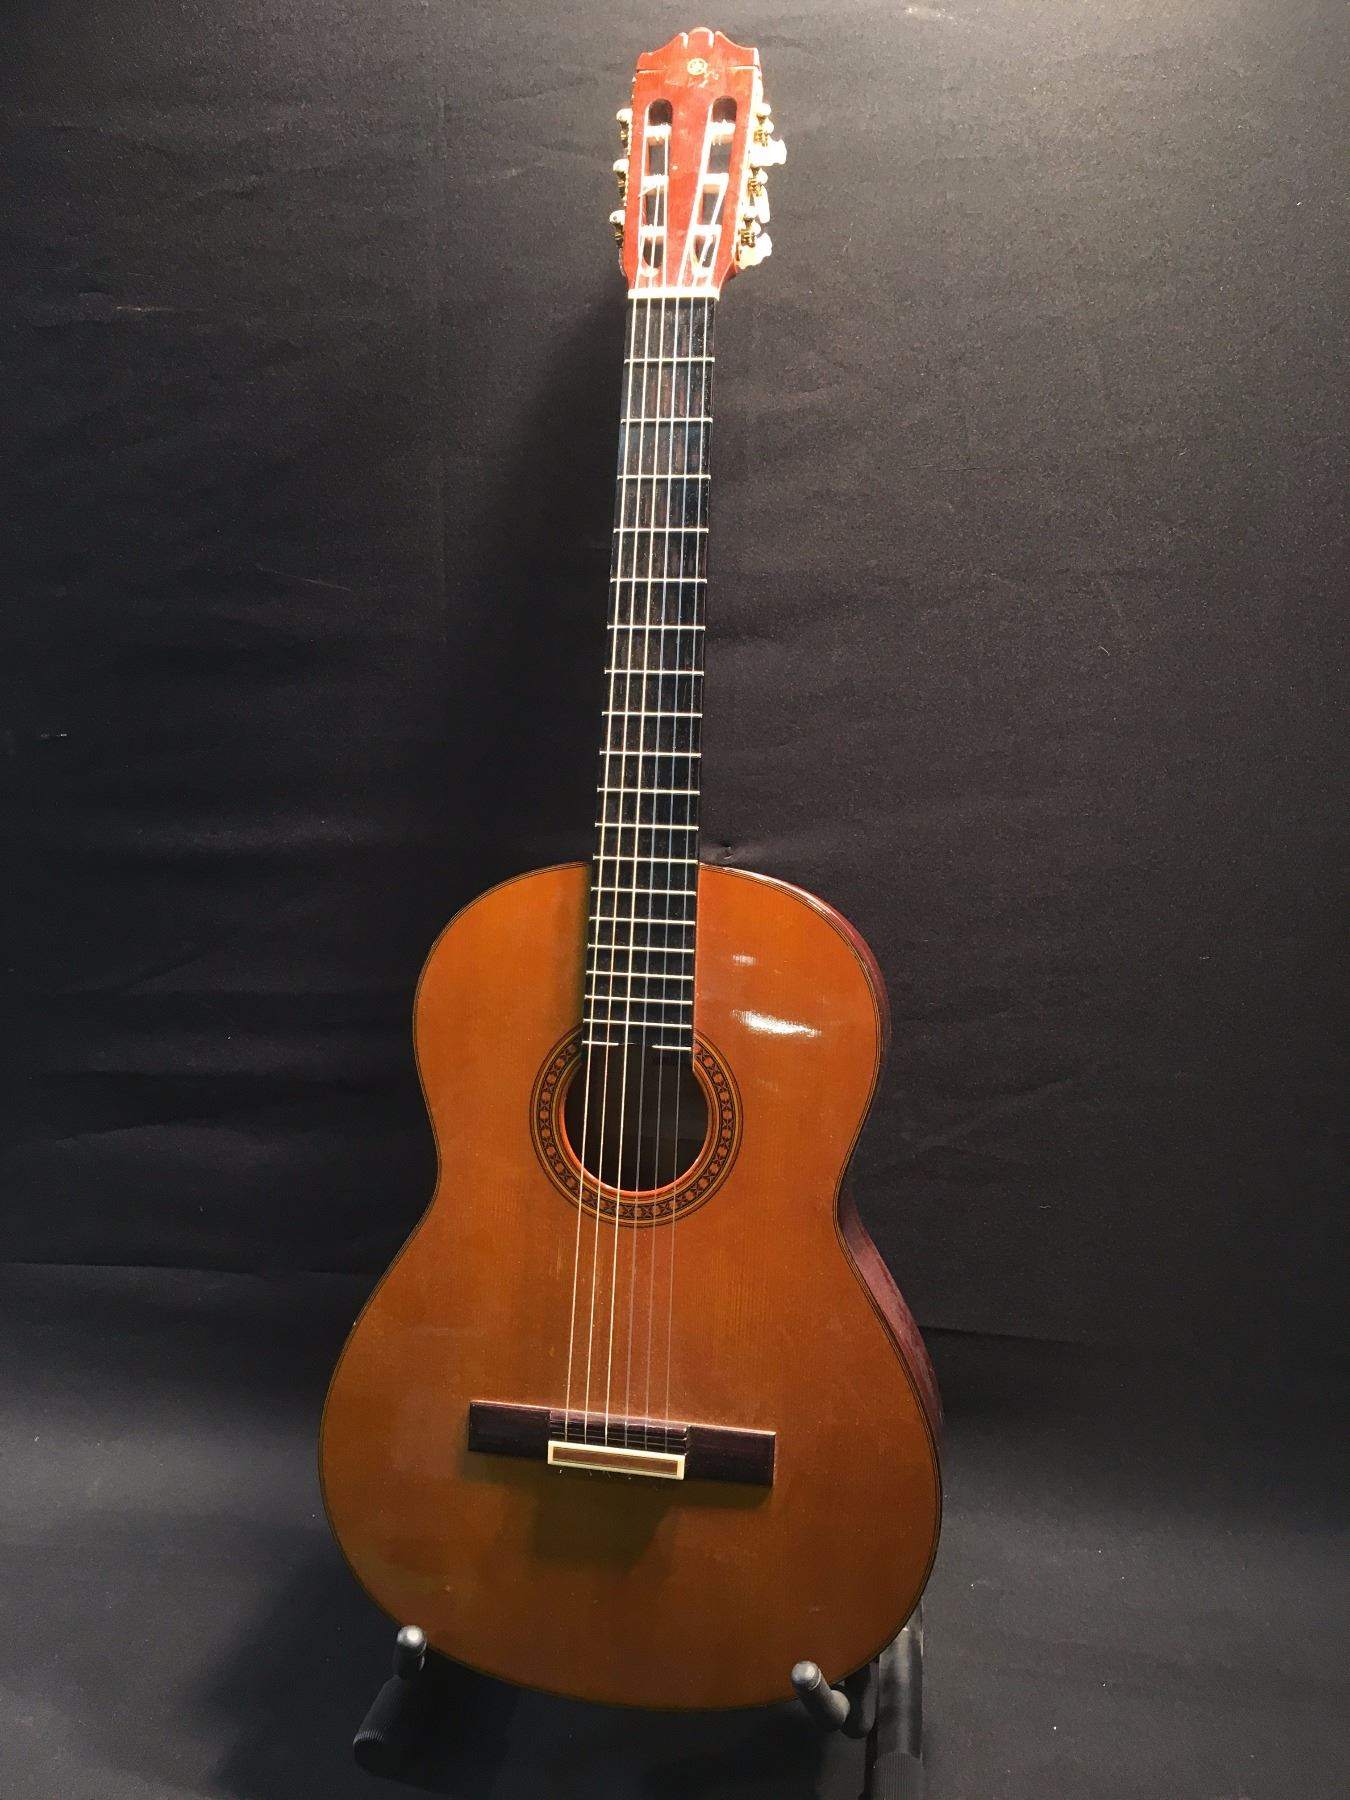 dating yamaha guitarer efter serienumre tri state dating